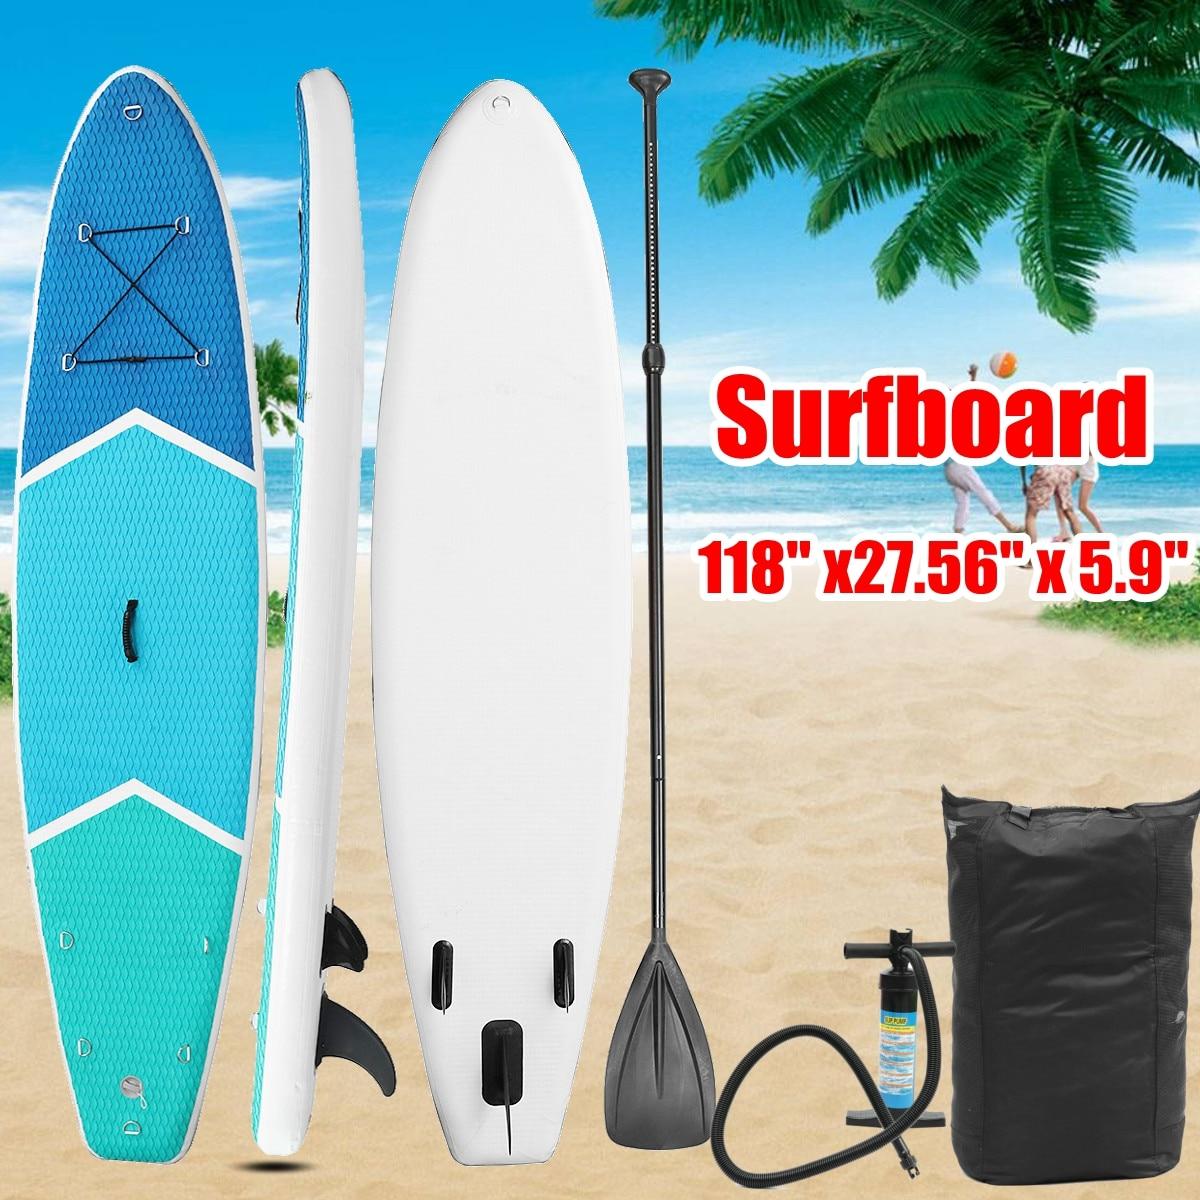 300 70 15cm inflatable surfboard Stand Up SUP Board Brett Surf aufblasbar paddle boat mit Repair